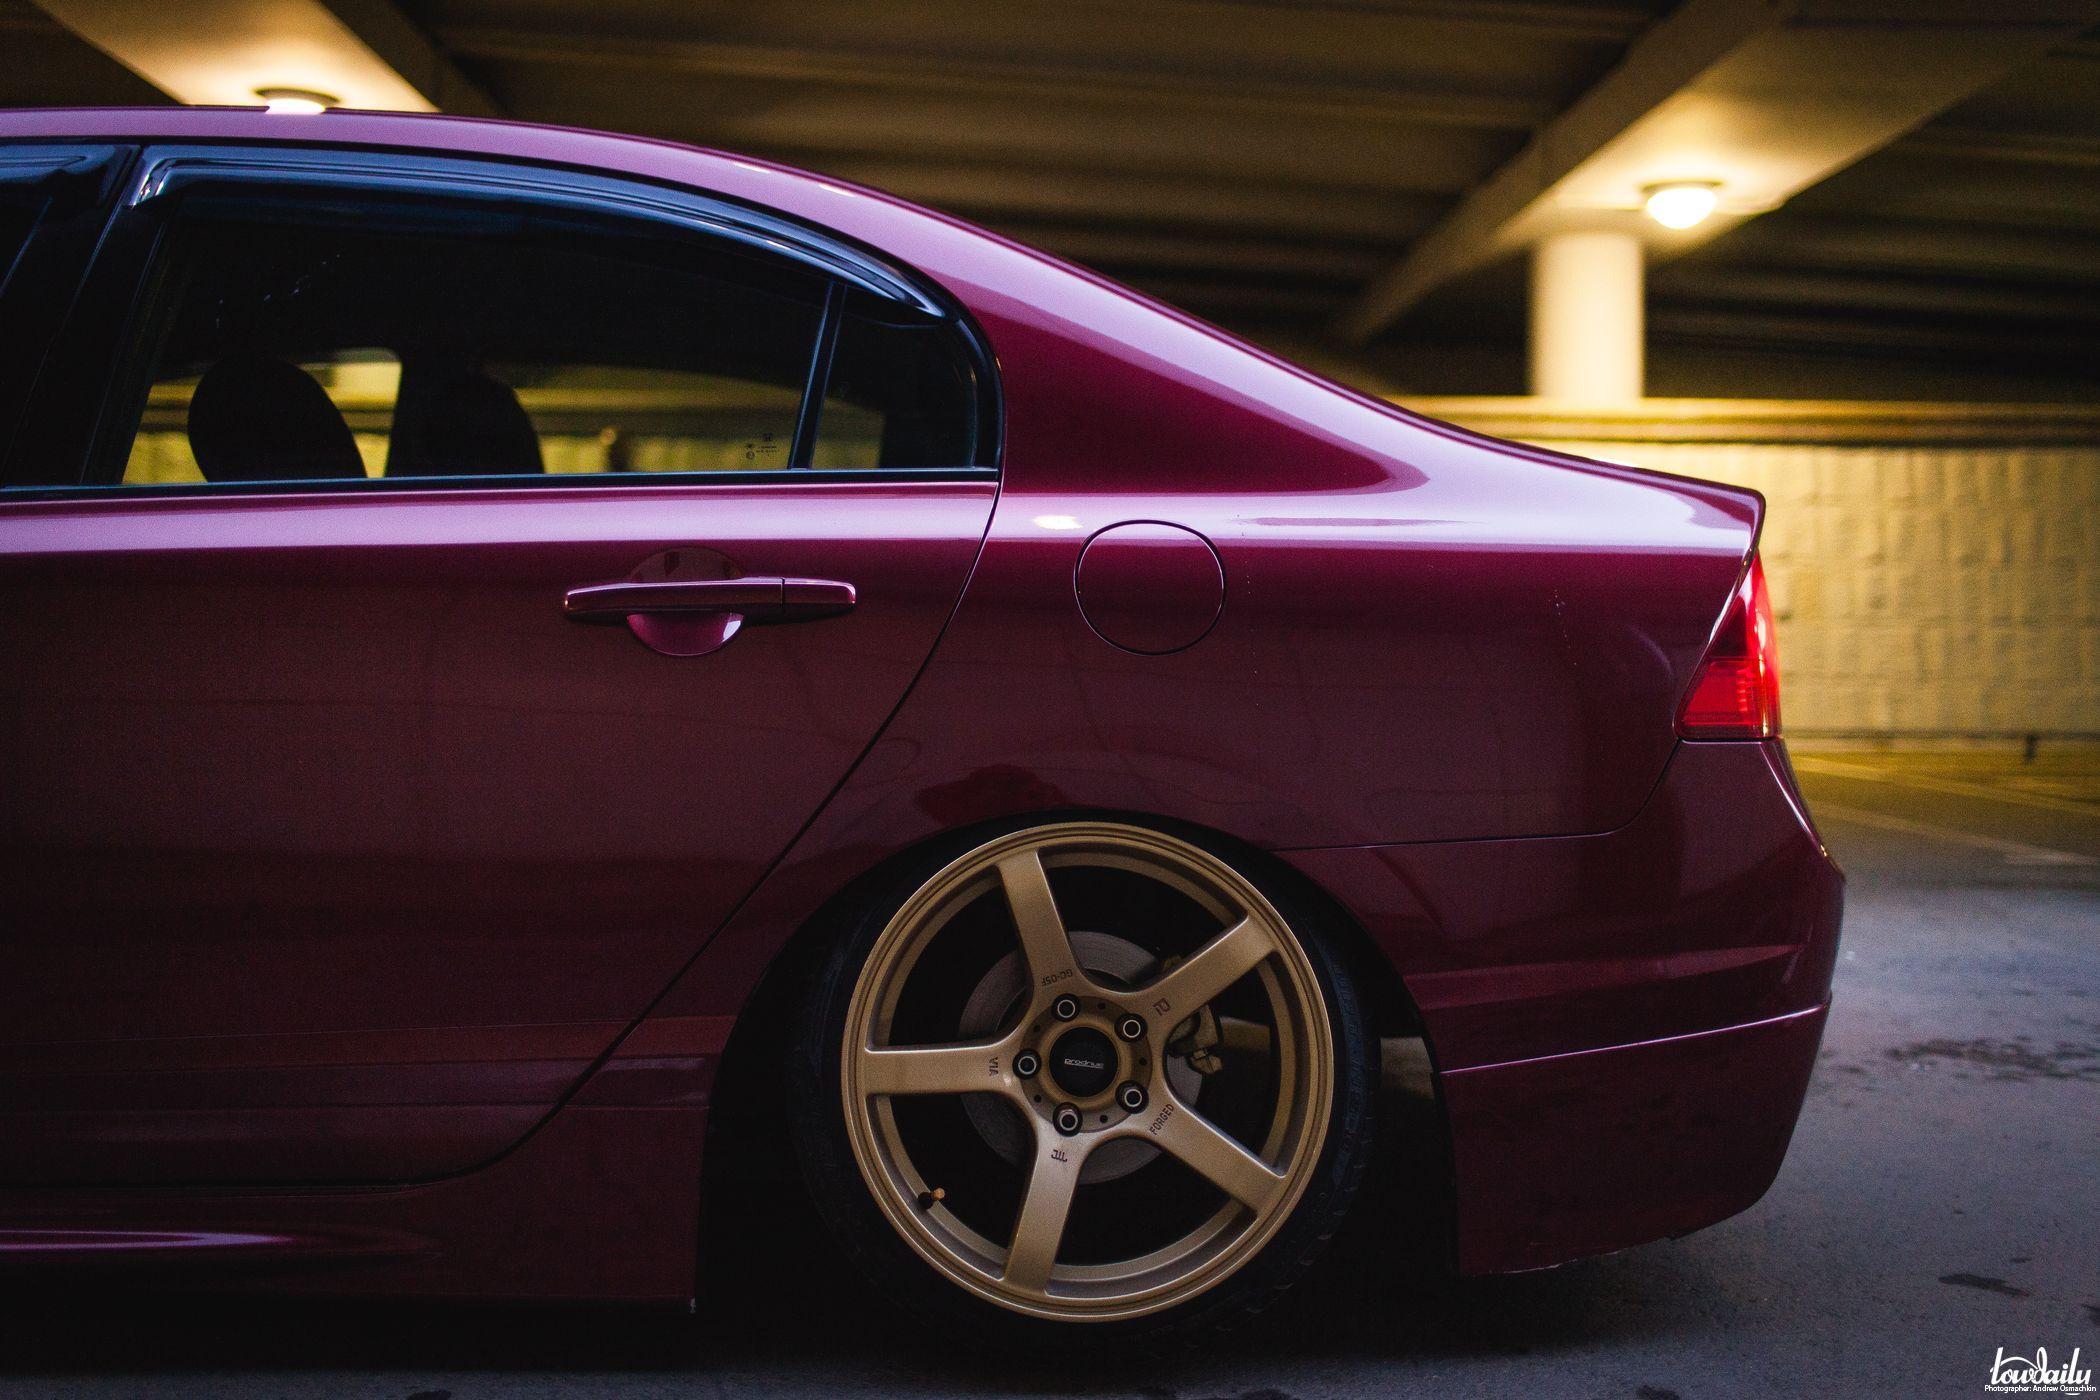 _Mg_5524_Honda_Civic